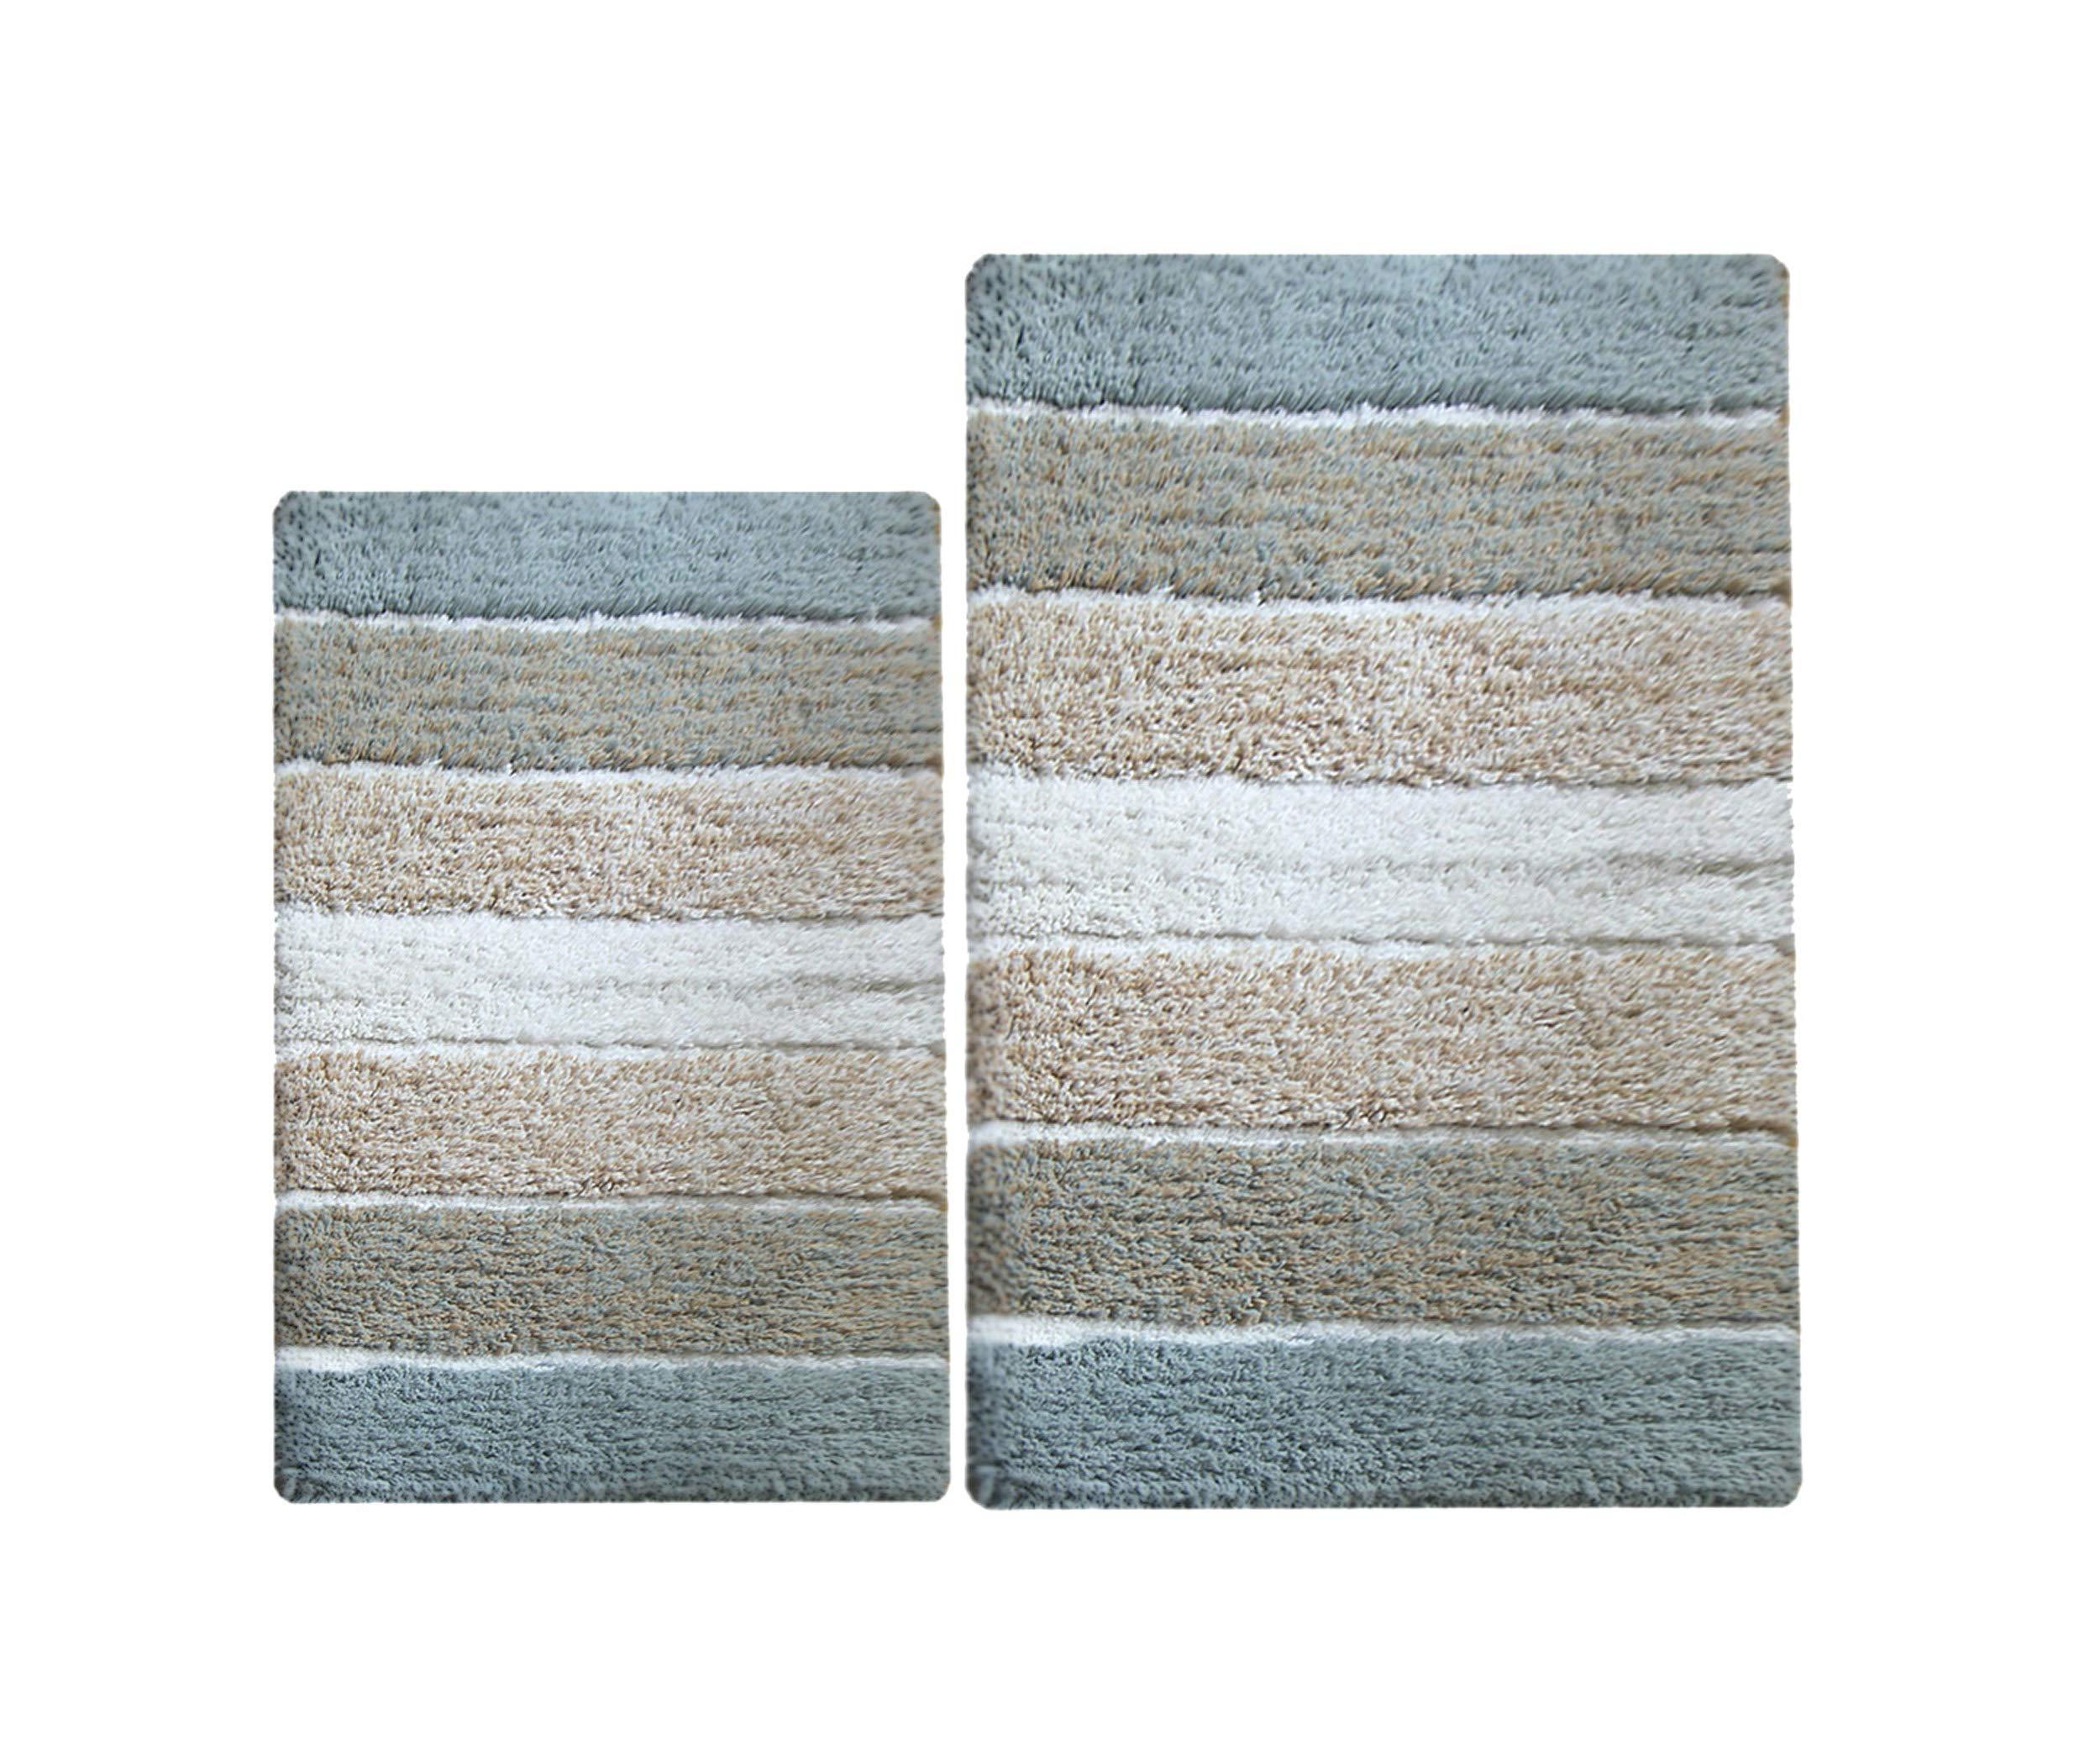 Chardin Home - 100% Pure Cotton - 2 Piece Cordural Stripe Bath Rug Set, (24''x40'' & 21''x34'') Gray-Beige with Latex spray non-skid backing